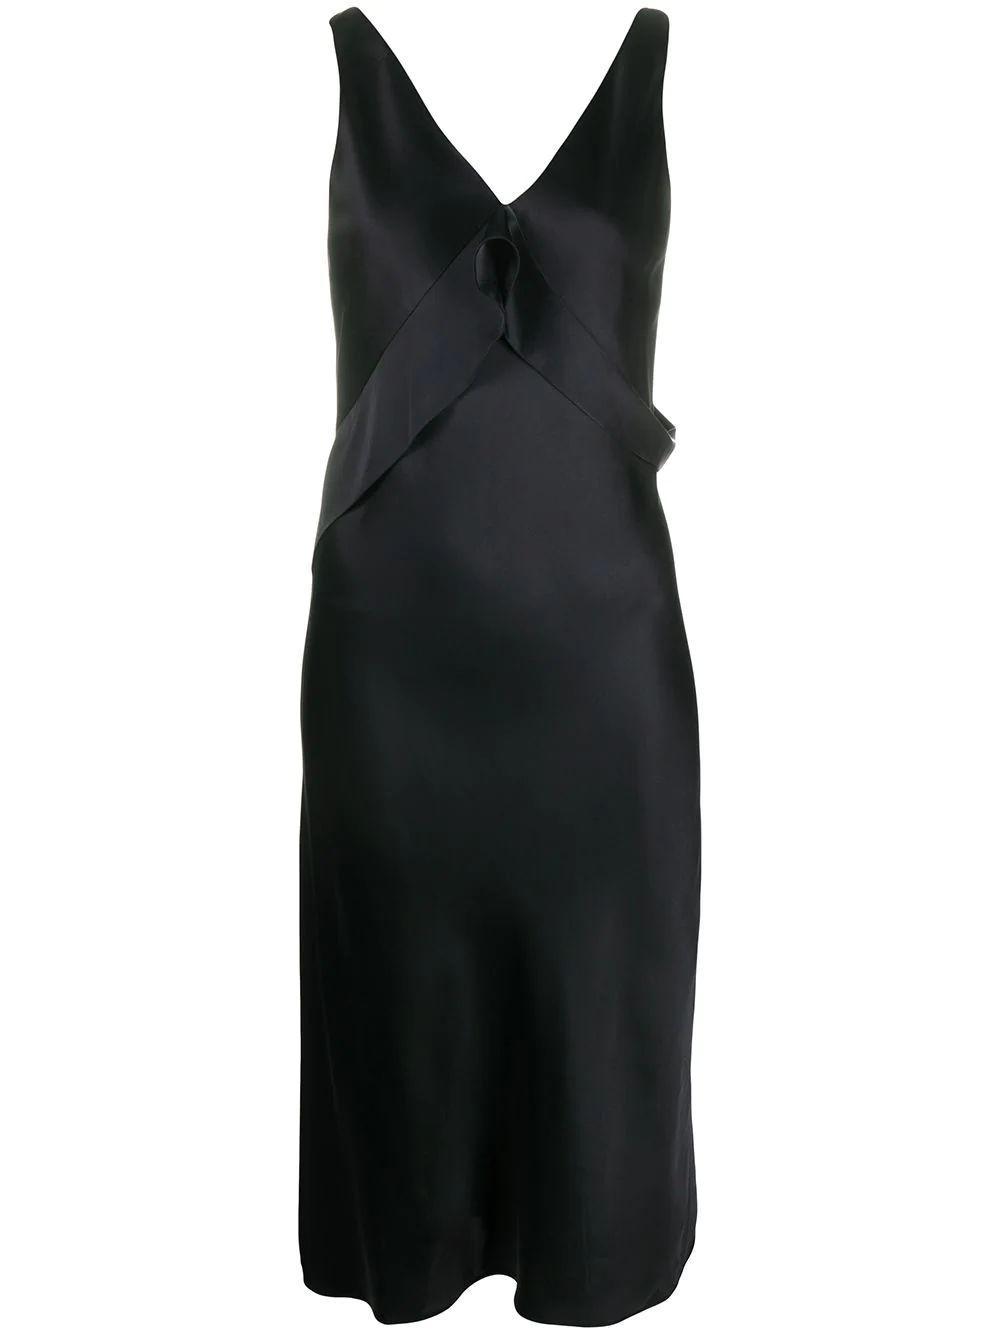 Double Satin Sash Dress Item # K01HW605